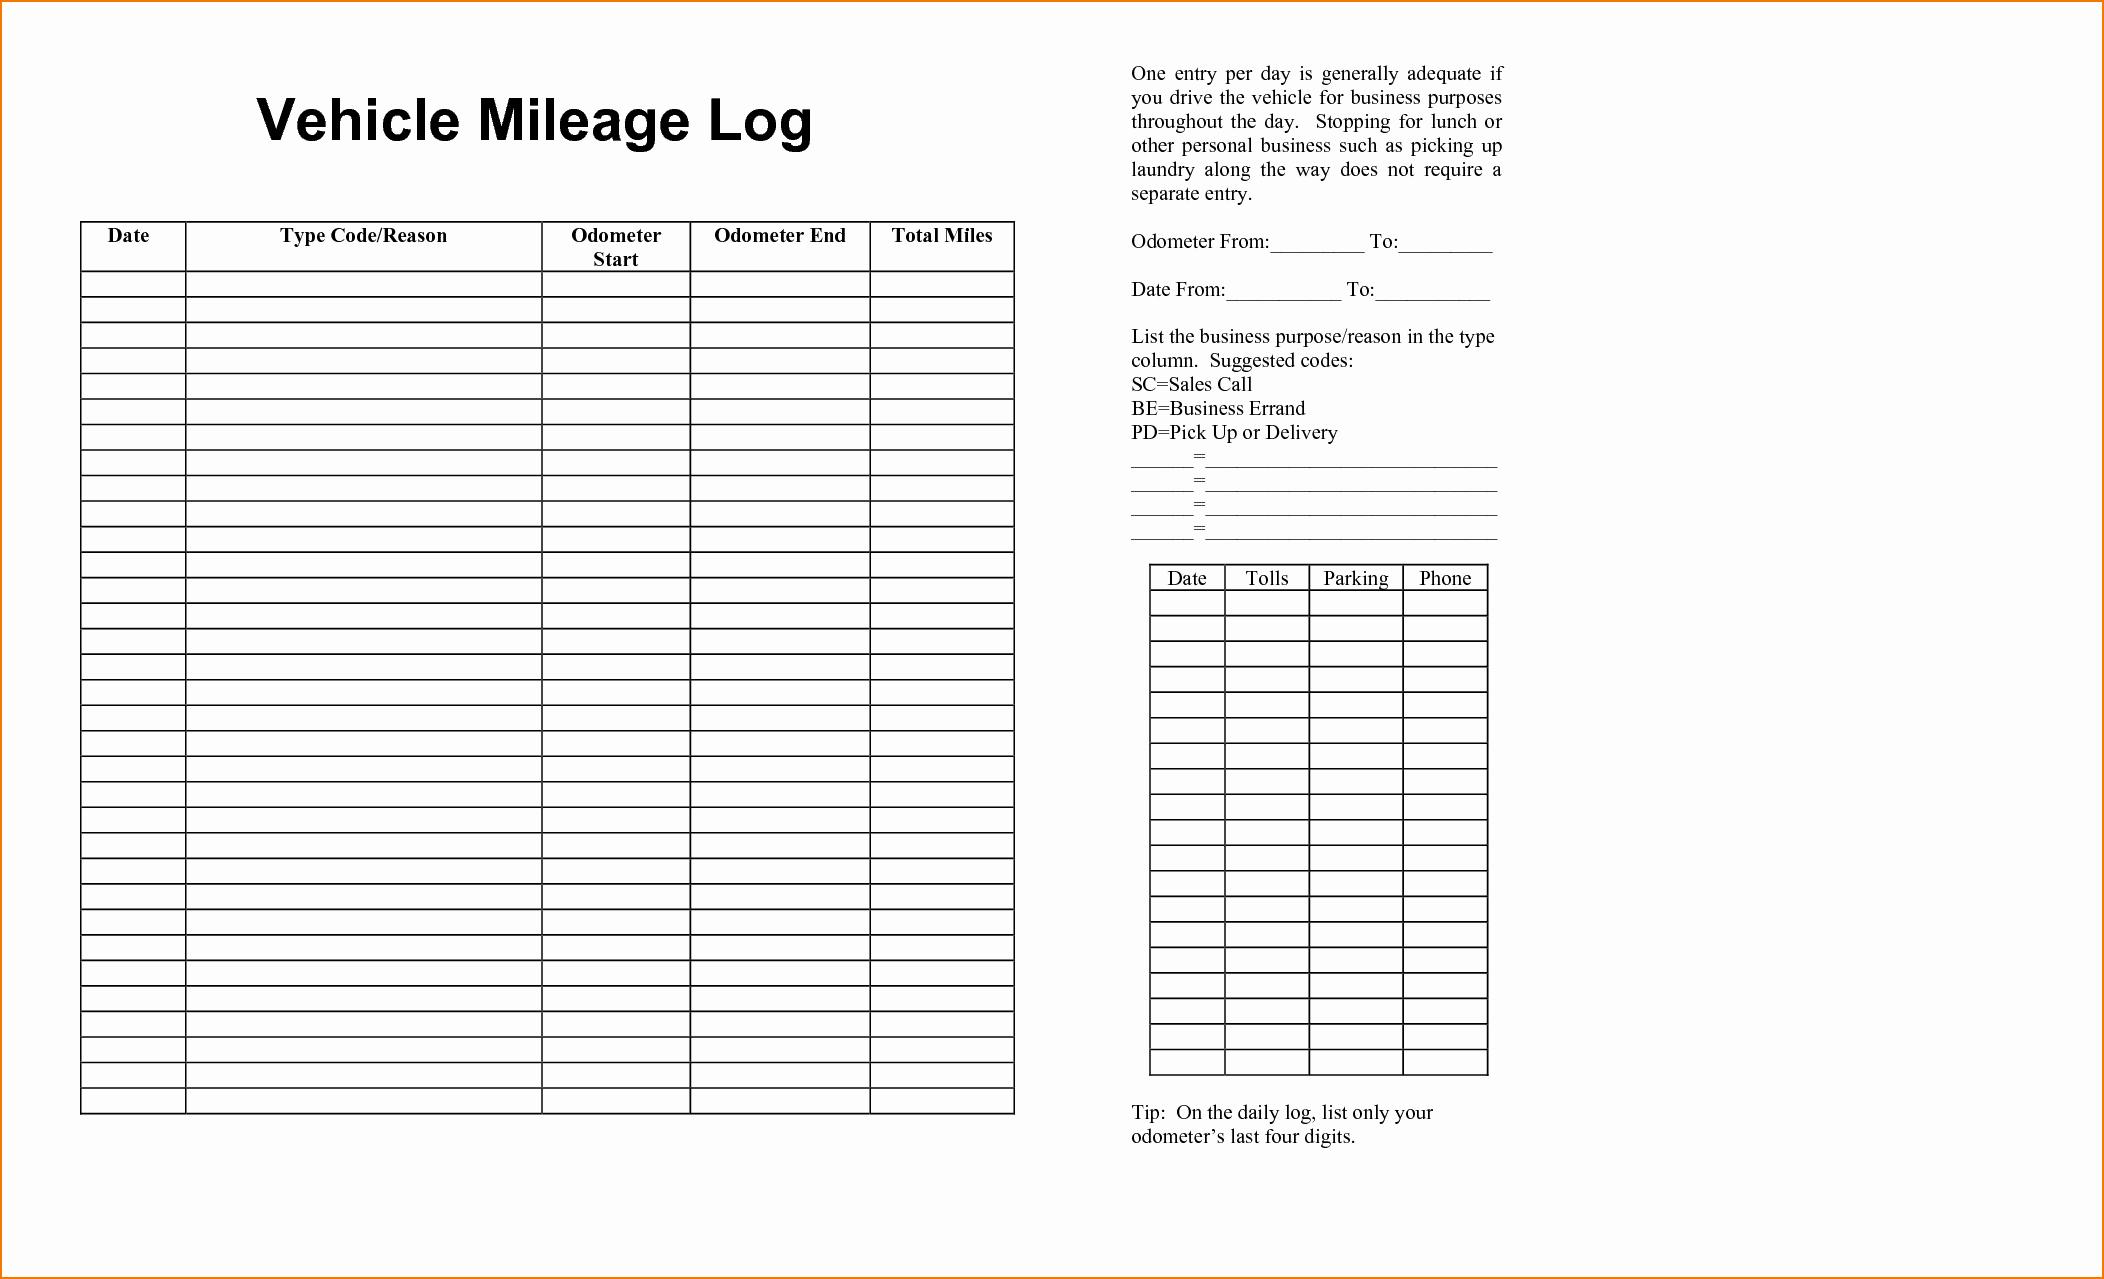 Mileage Log Sheet for Taxes Unique 6 Vehicle Mileage Log